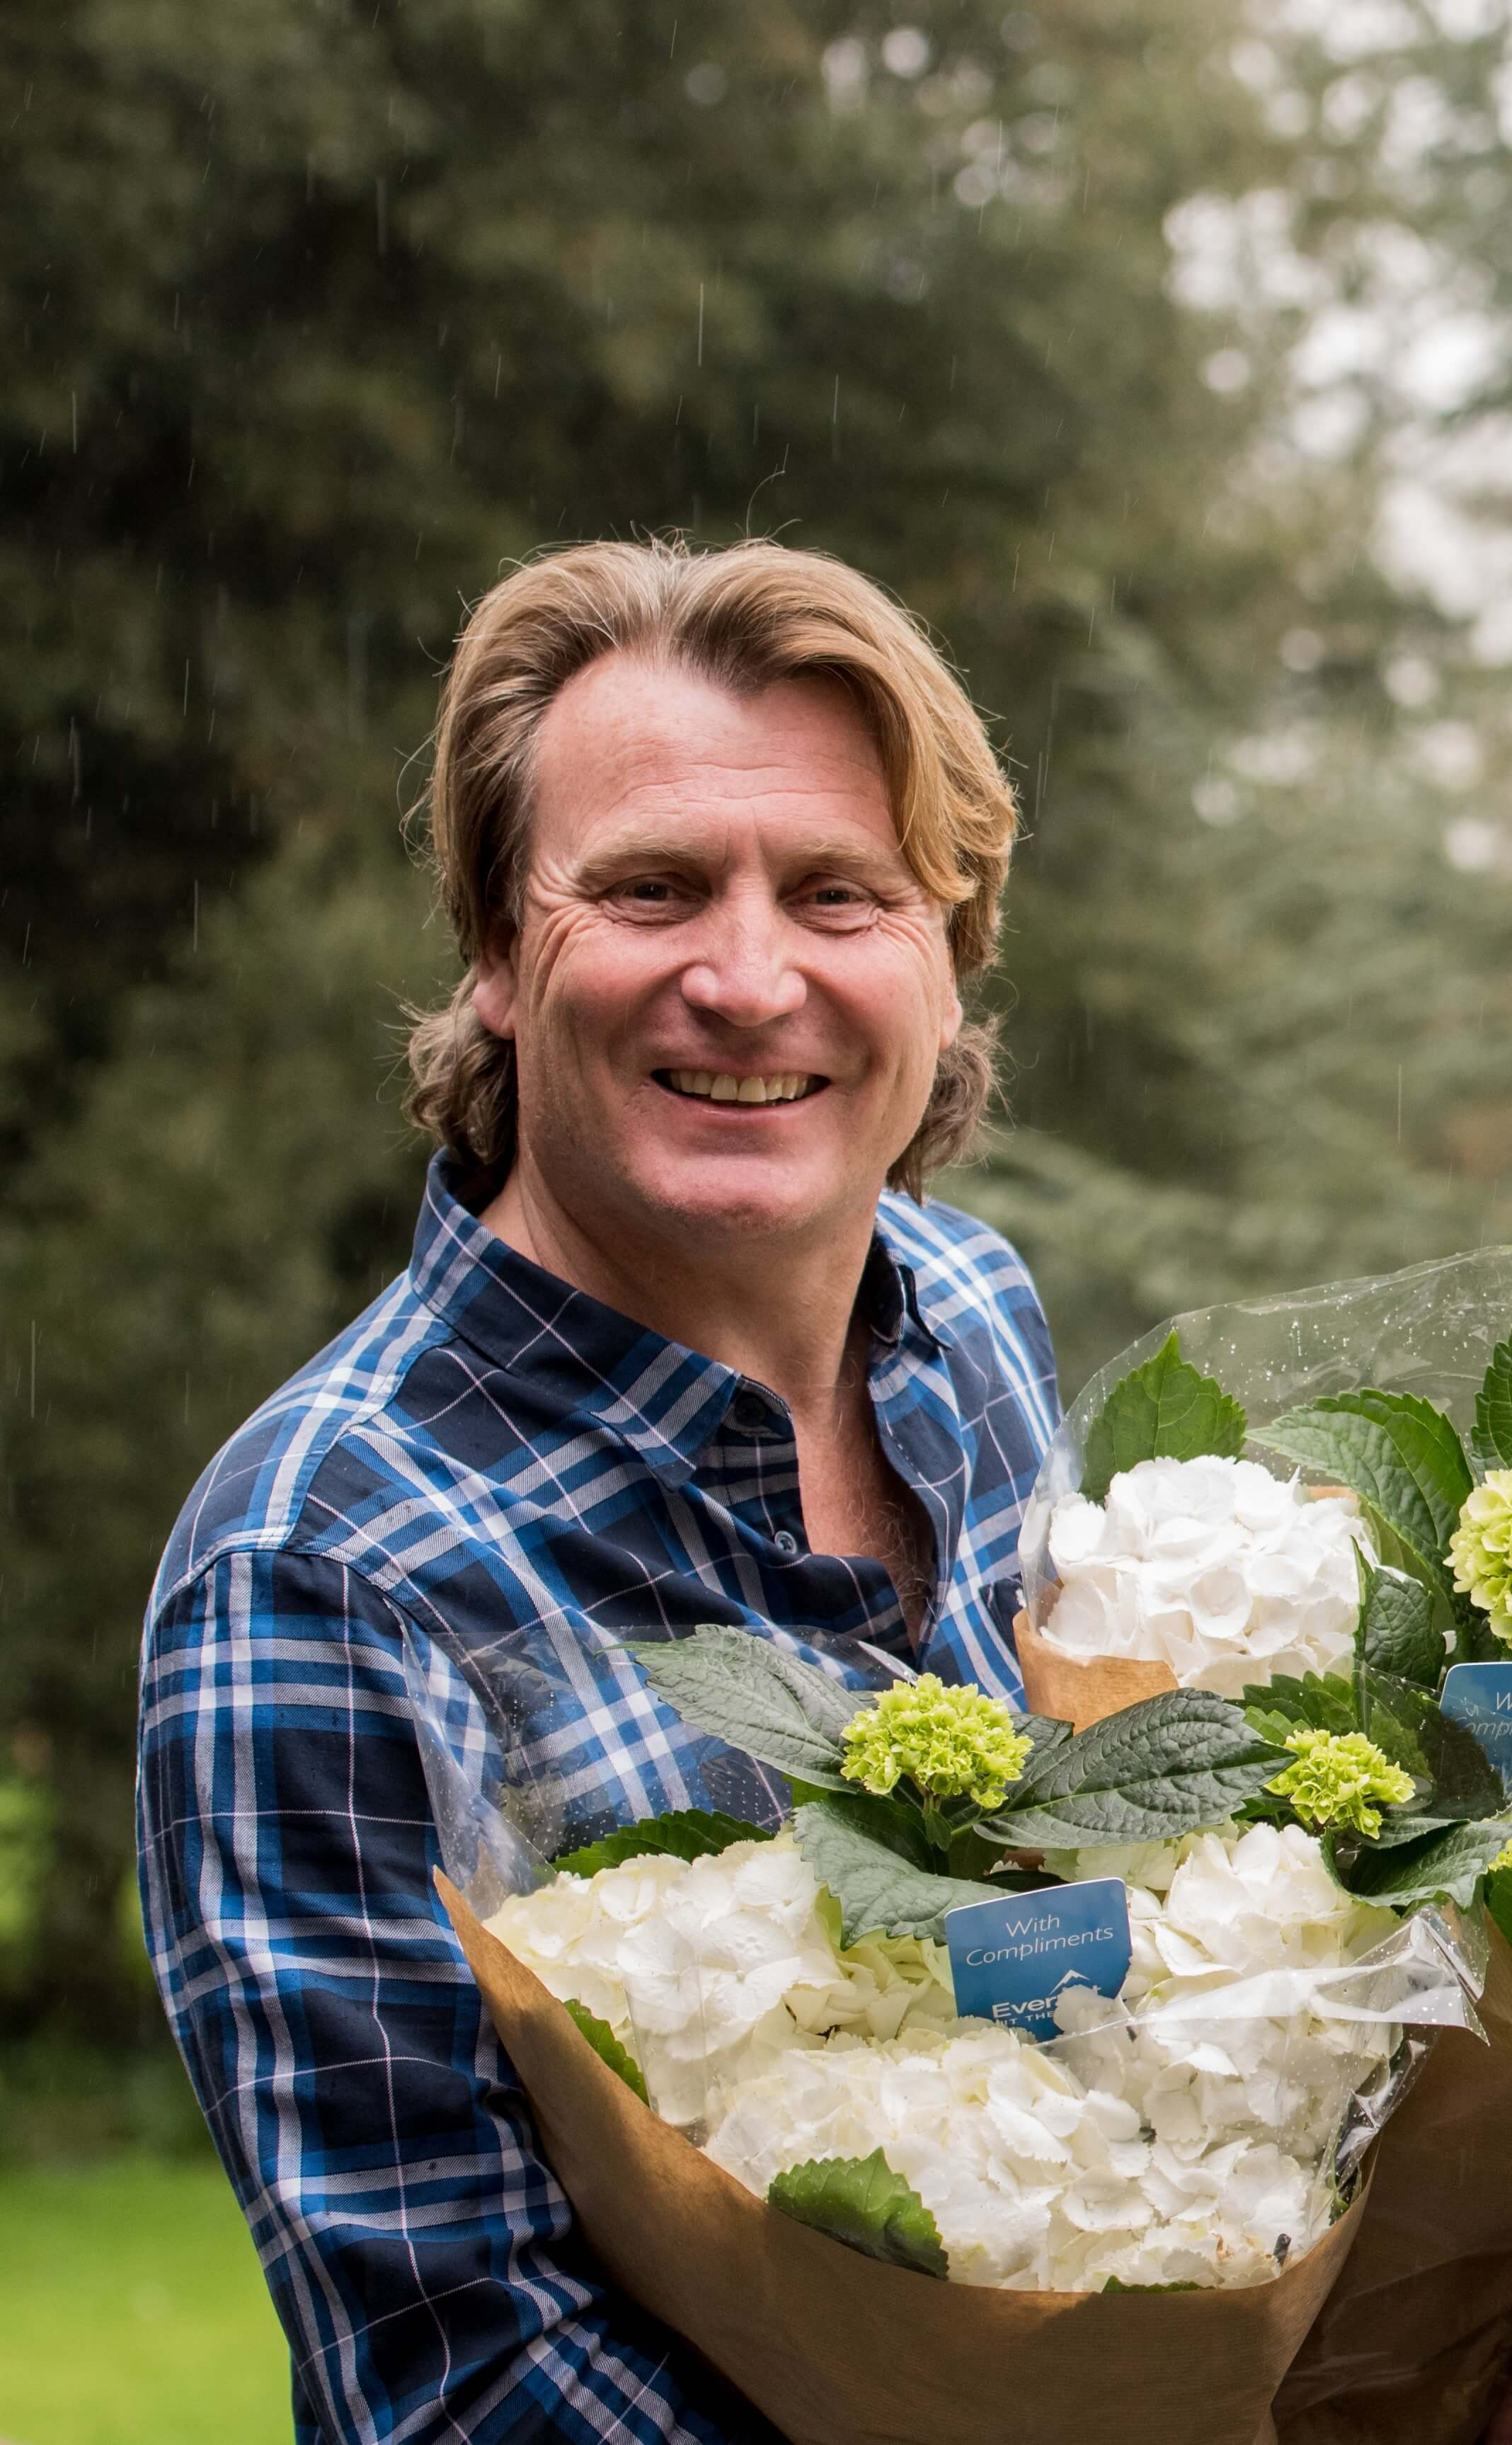 WI Spring Planting Tips by David Domoney